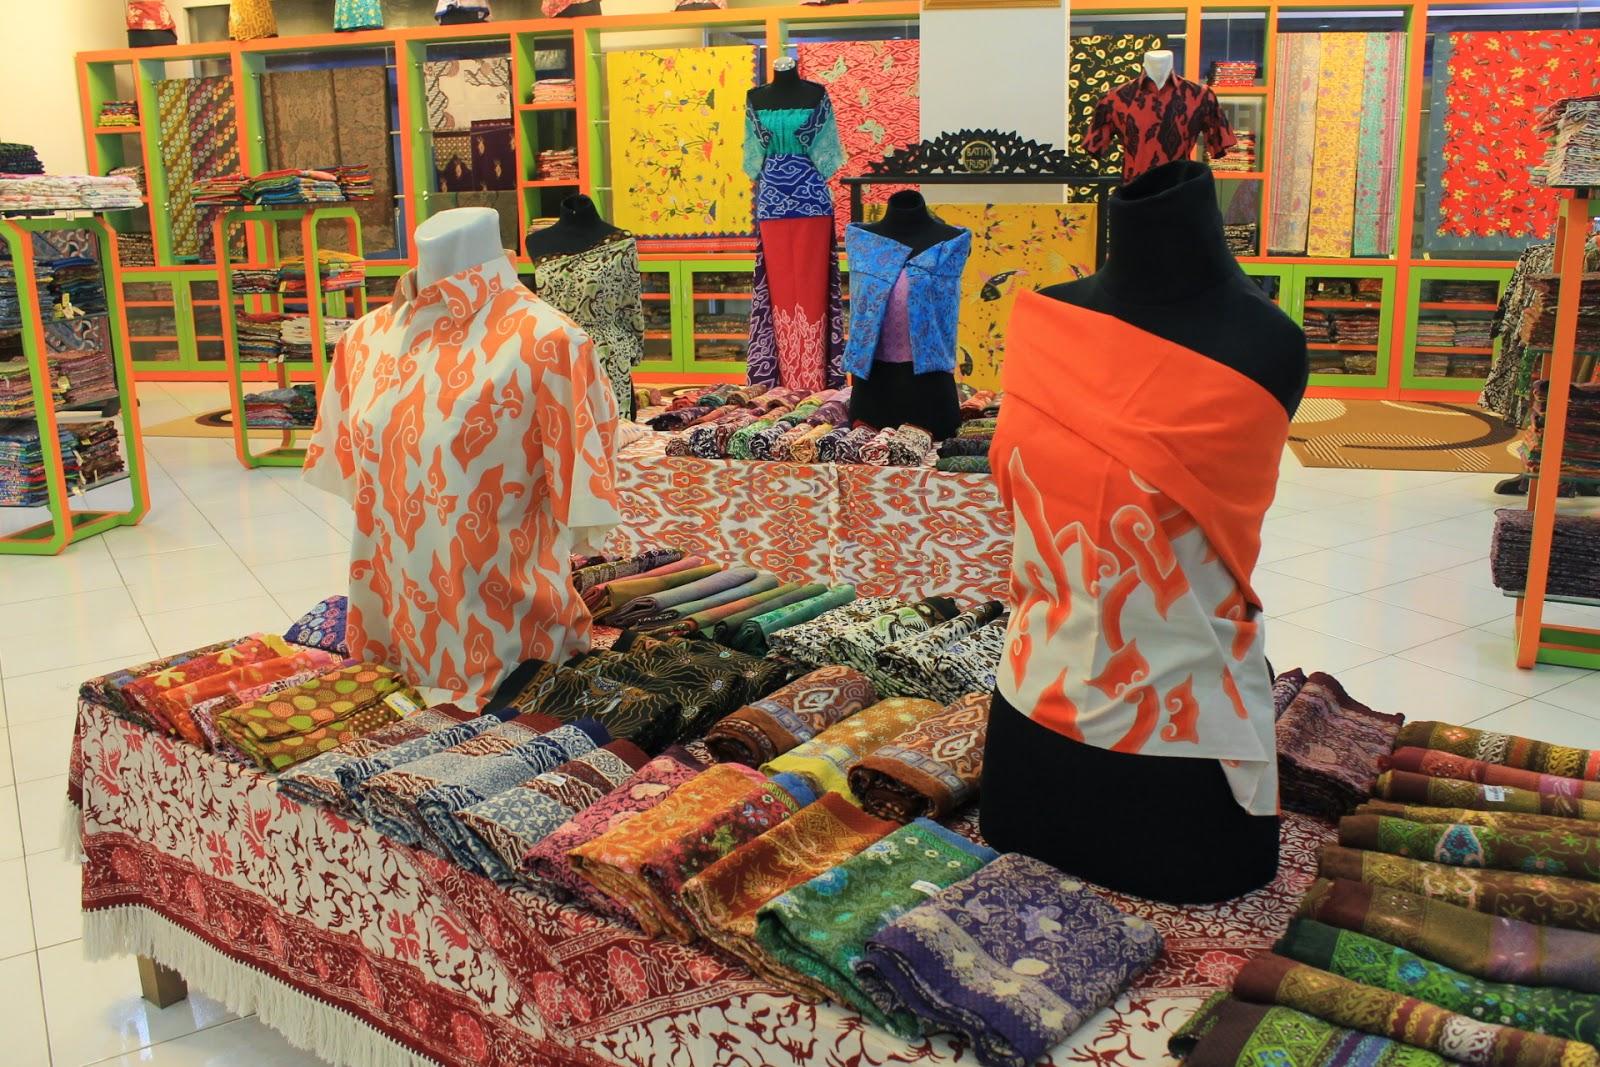 pusat grosir baju murah surabaya rh grosiransurabaya blogspot com toko batik murah surabaya toko batik di surabaya selatan